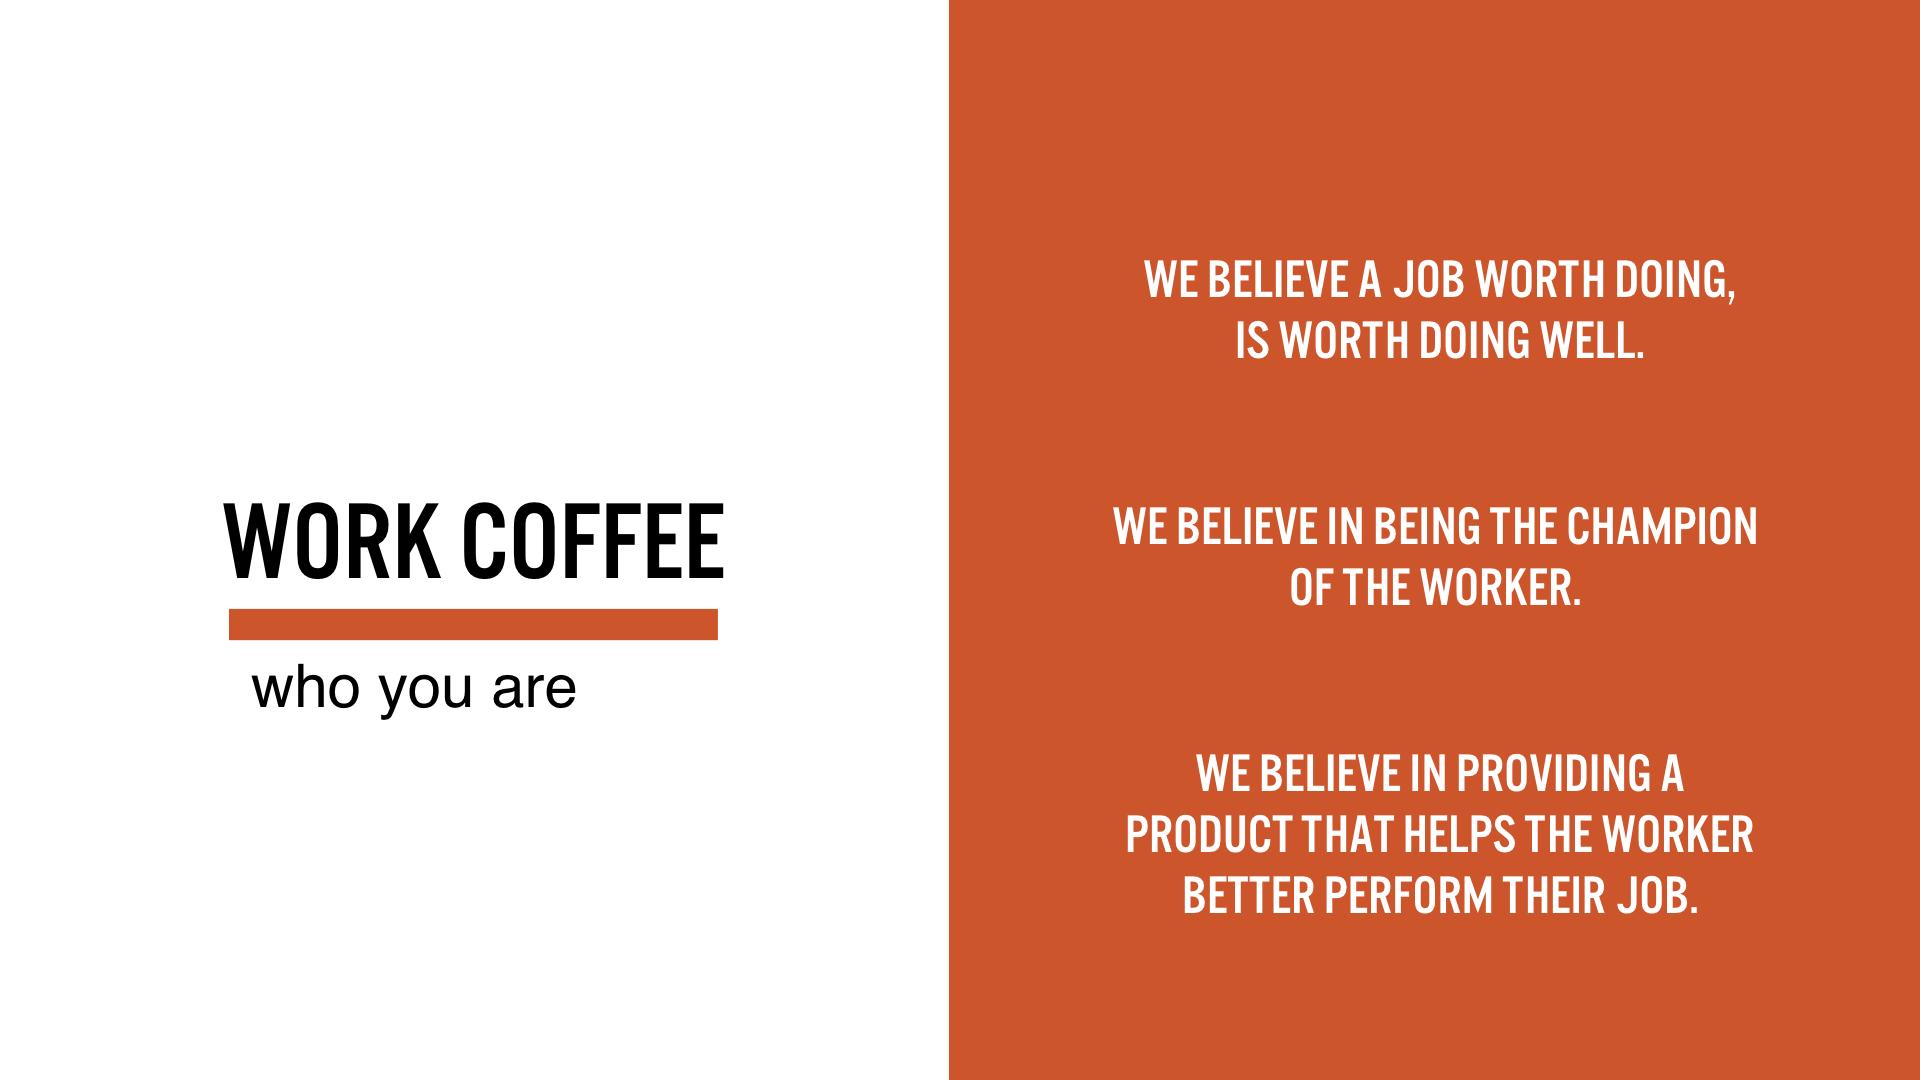 WORK COFFEE PRESENTATION FINAL.004.jpeg